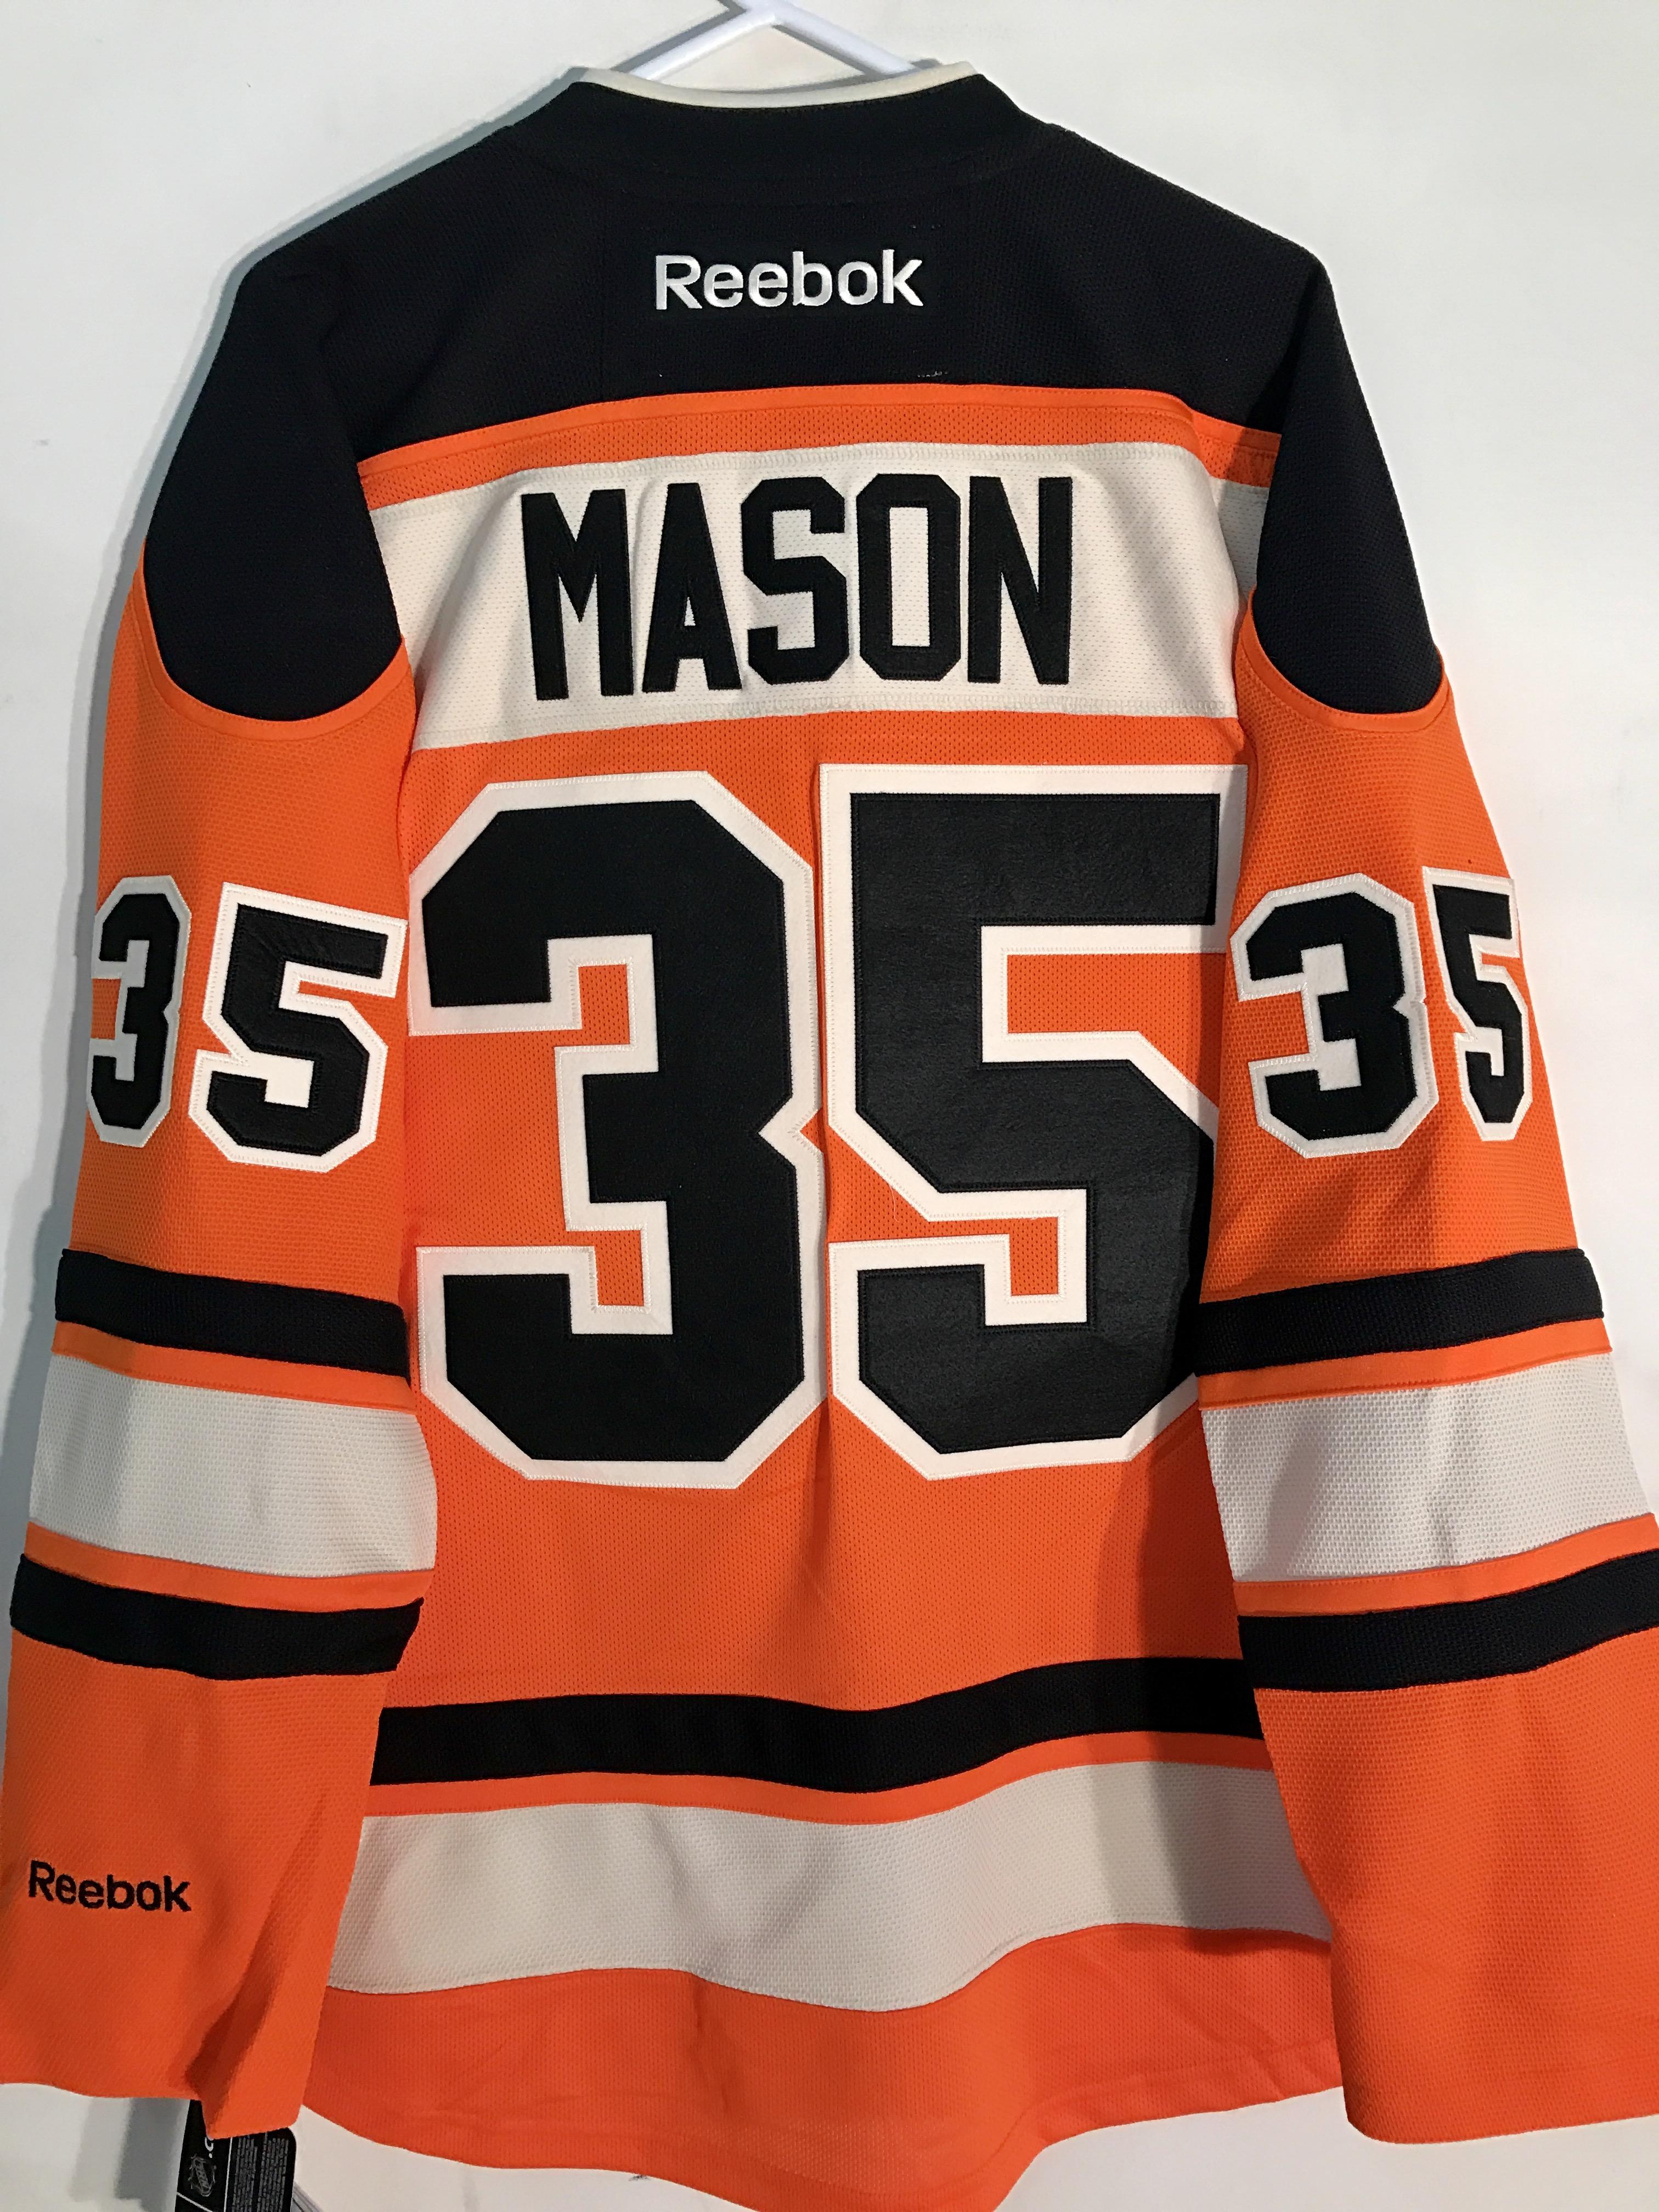 844ebb7d0 Details about Reebok Premier NHL Jersey Philadelphia Flyers Steve Mason  Orange Alt sz M